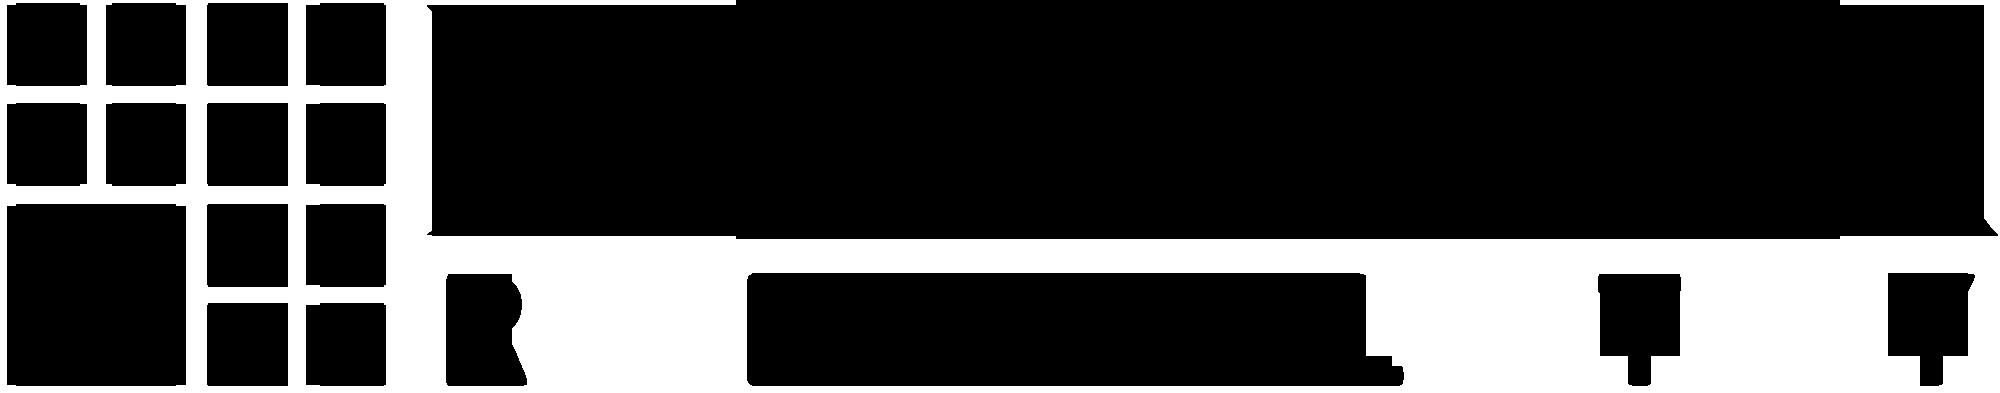 Big Block Realty  logo